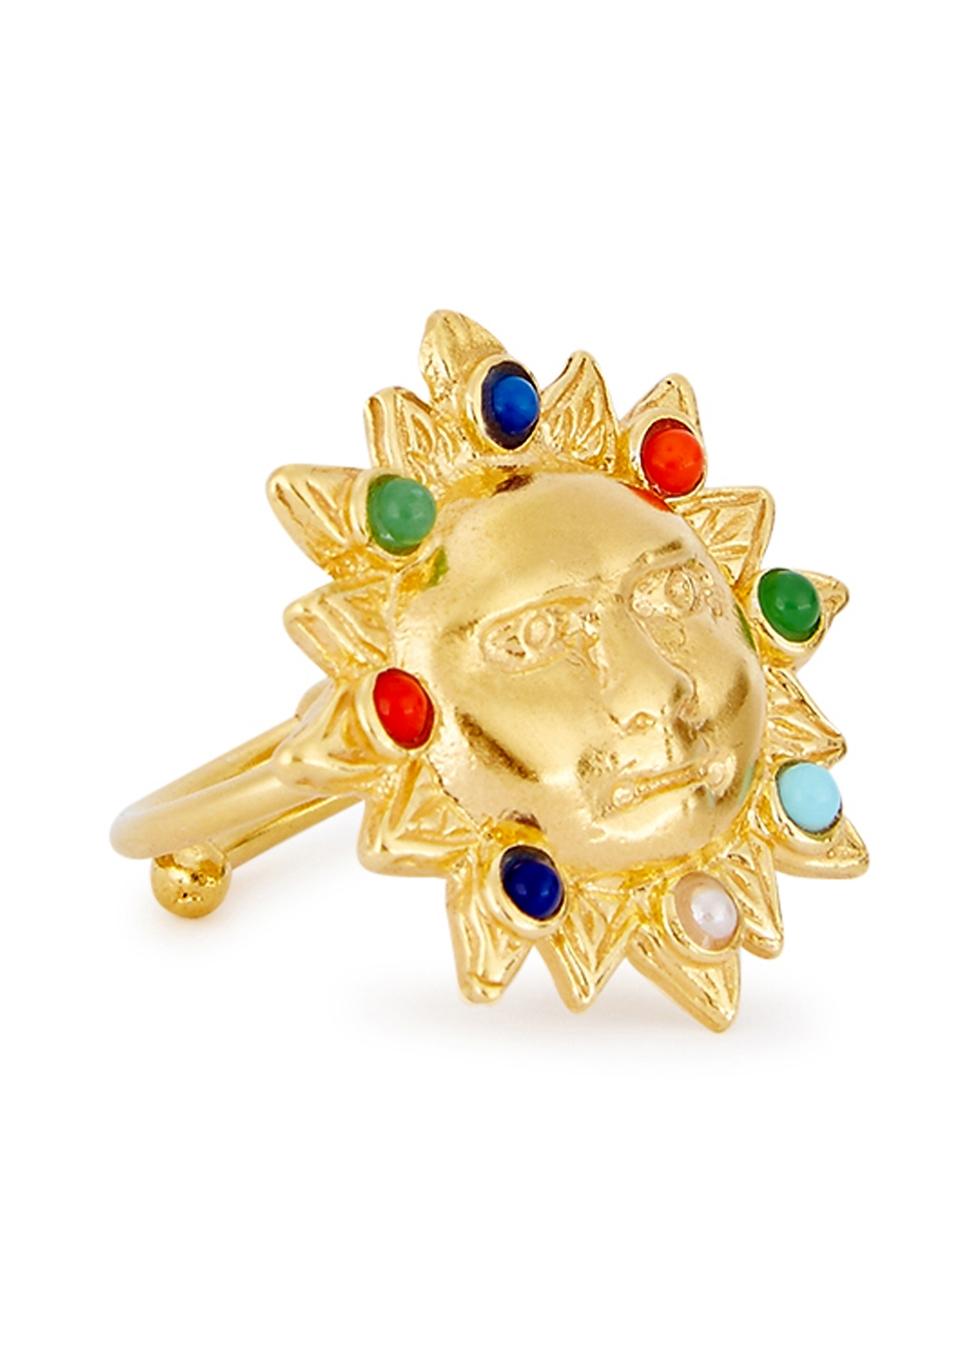 SORU JEWELLERY TREASURES 18CT GOLD-PLATED RING